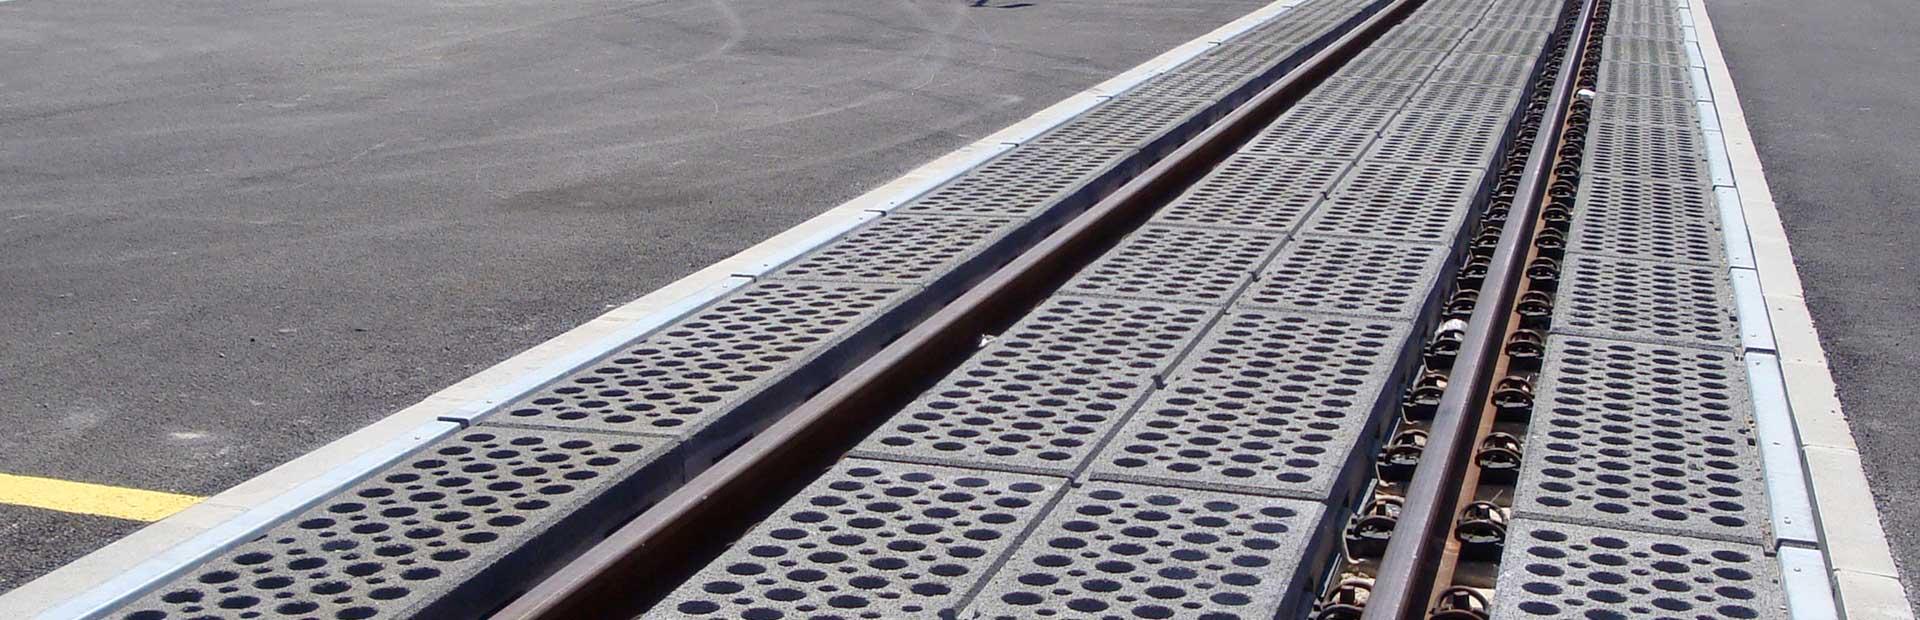 Rail experience